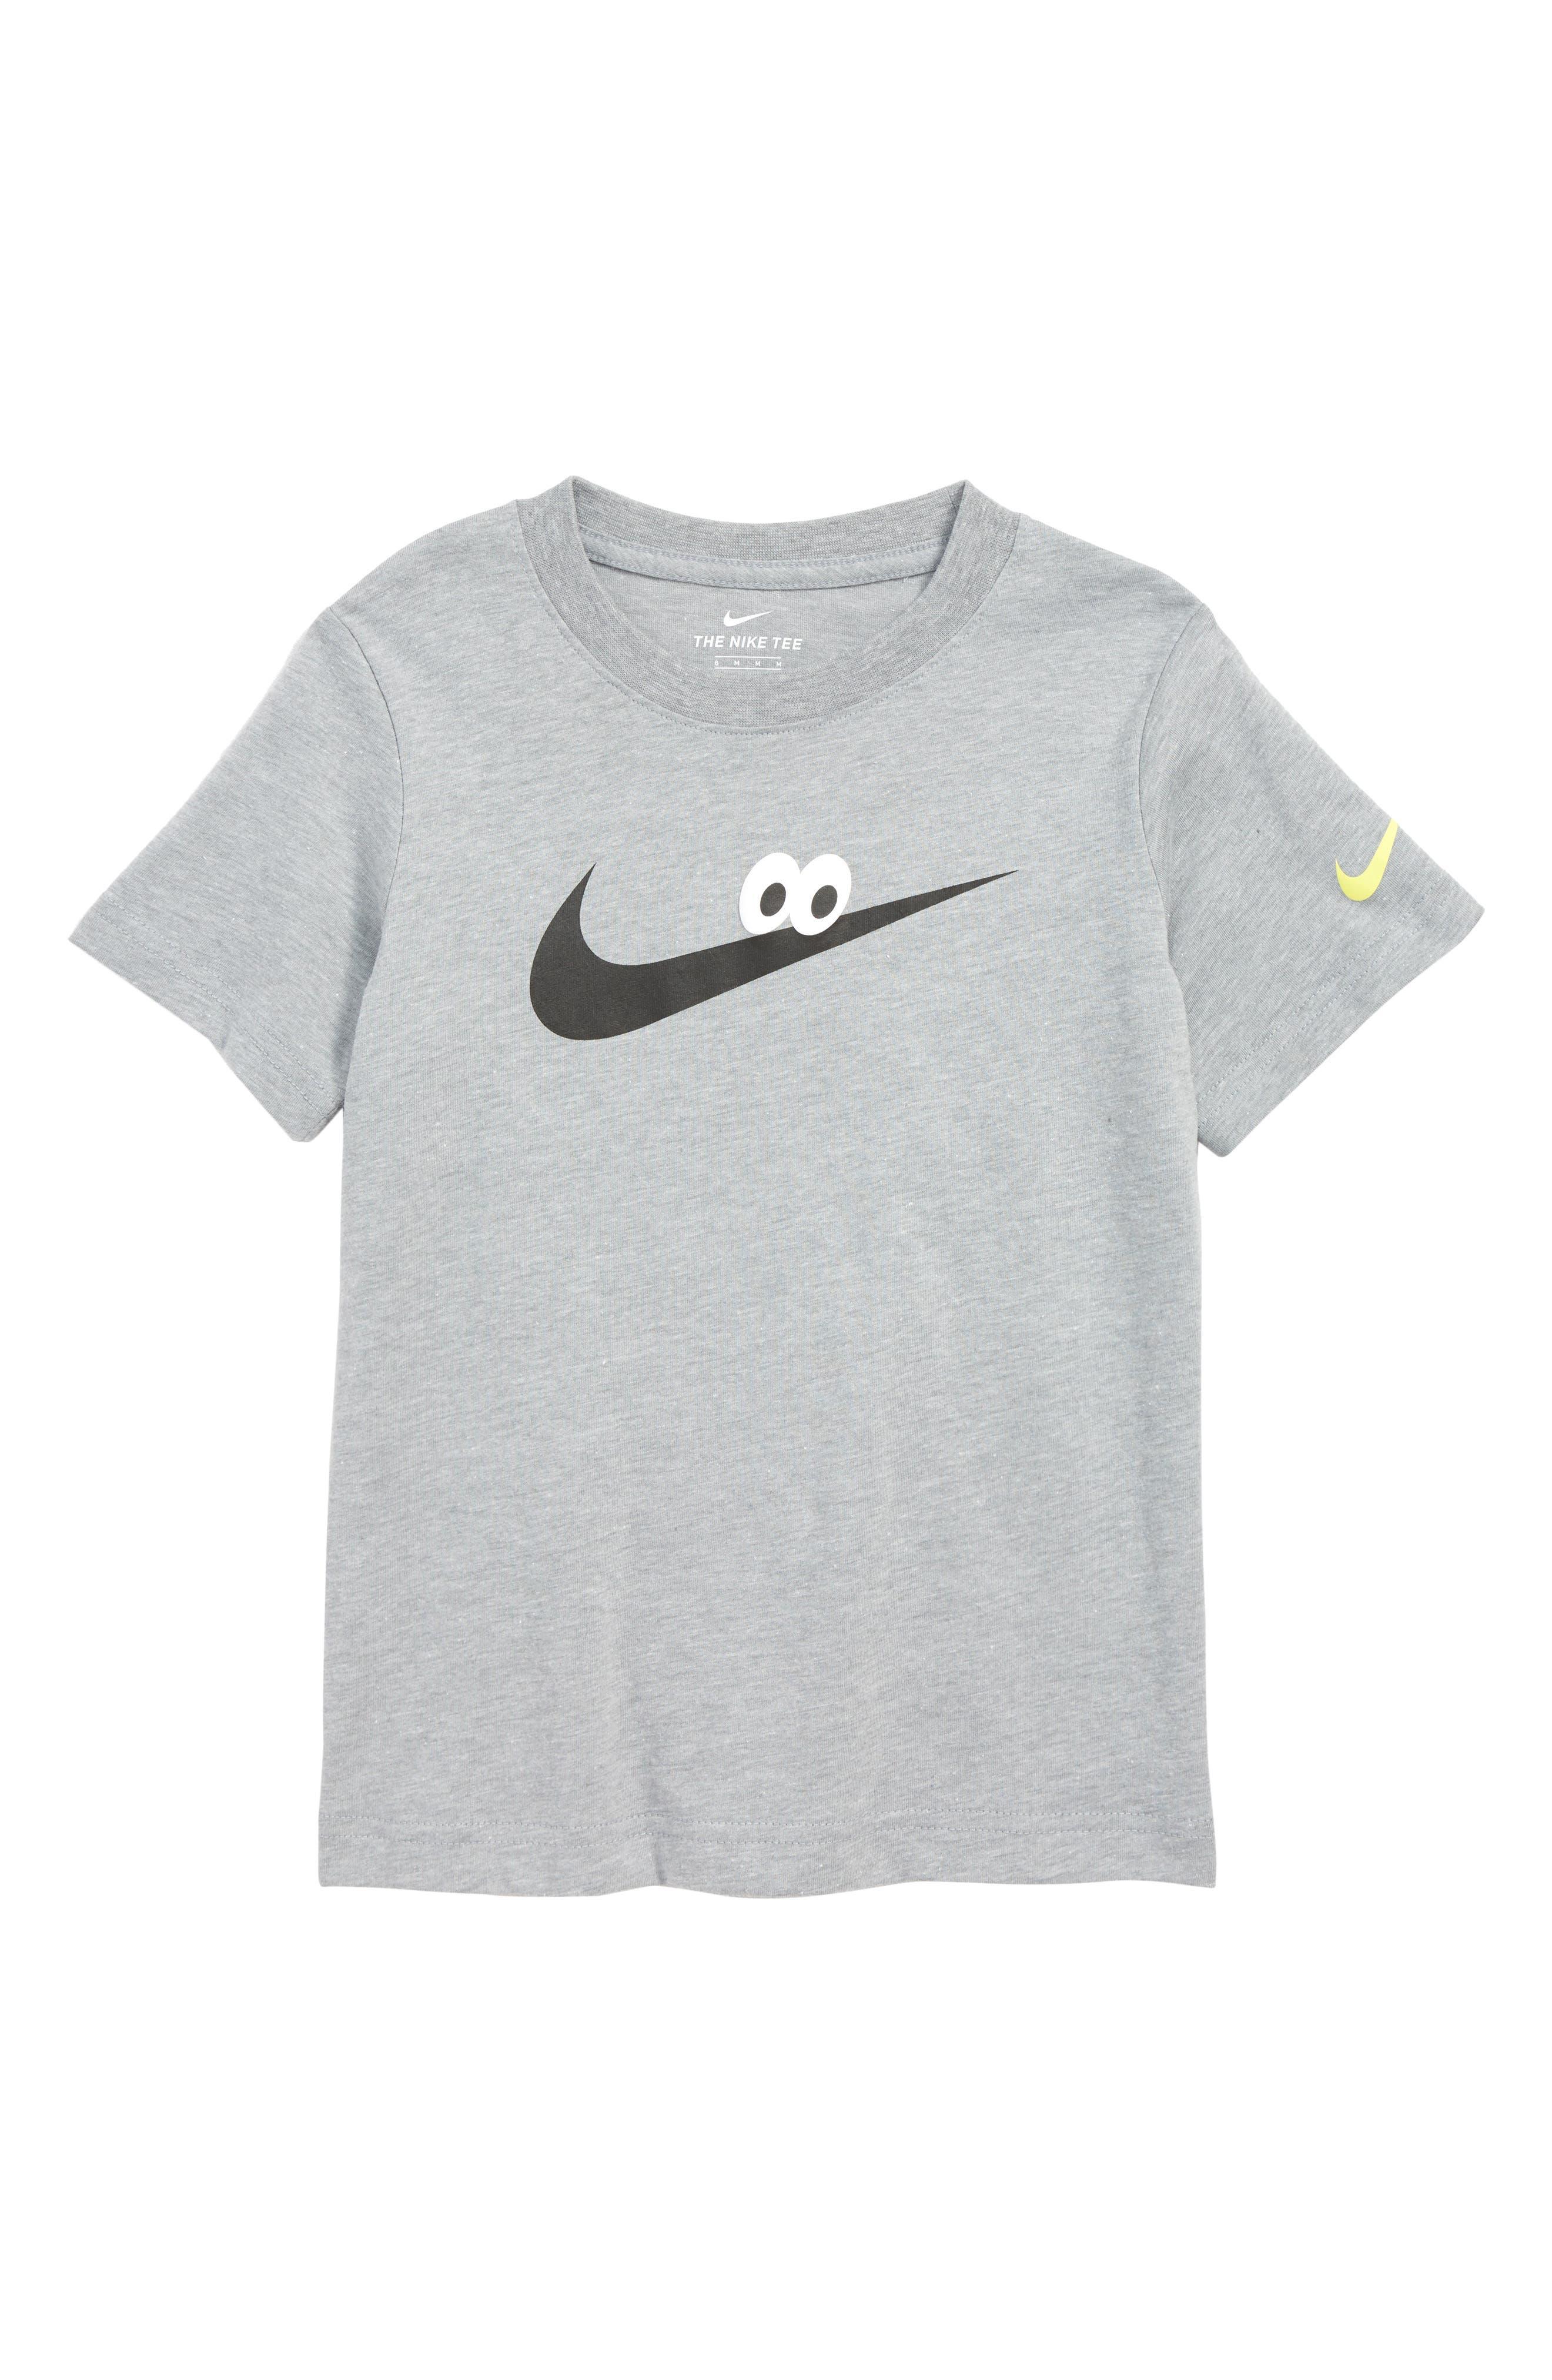 Googly Eyes Swoosh T-Shirt,                         Main,                         color, DK GREY HEATHER